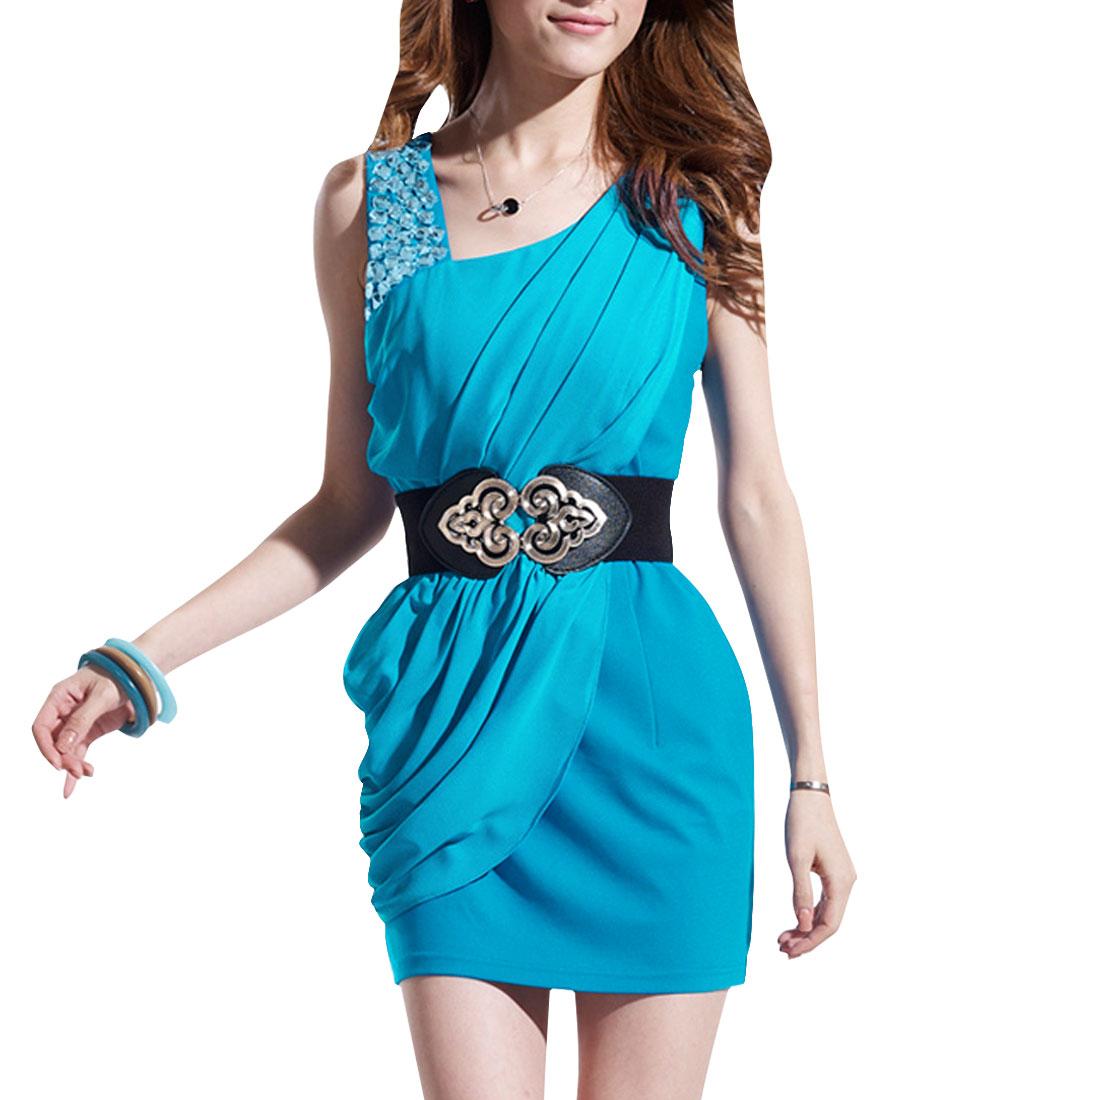 Women Sleeveless Rhinestone Decor Sheath Dress Blue XS